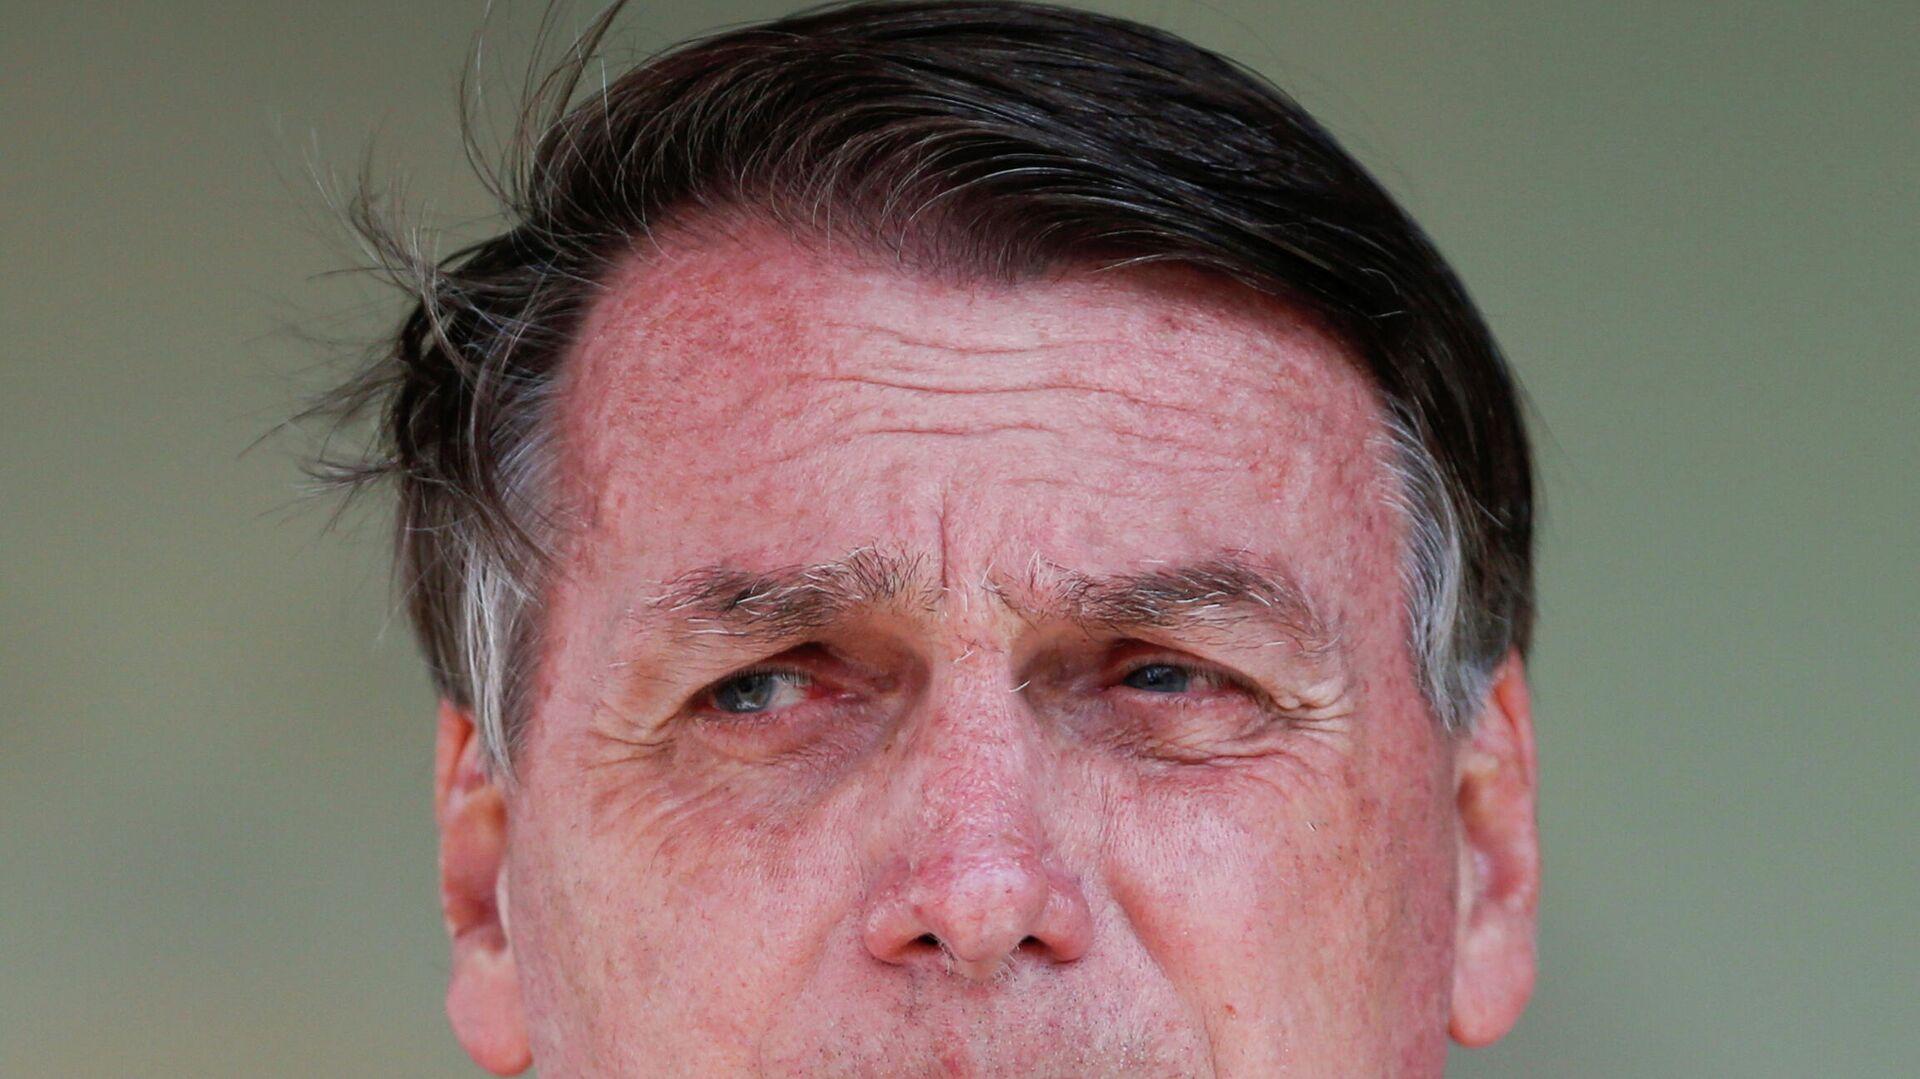 Jair Bolsonaro, presidente de Brasil - Sputnik Mundo, 1920, 20.04.2021